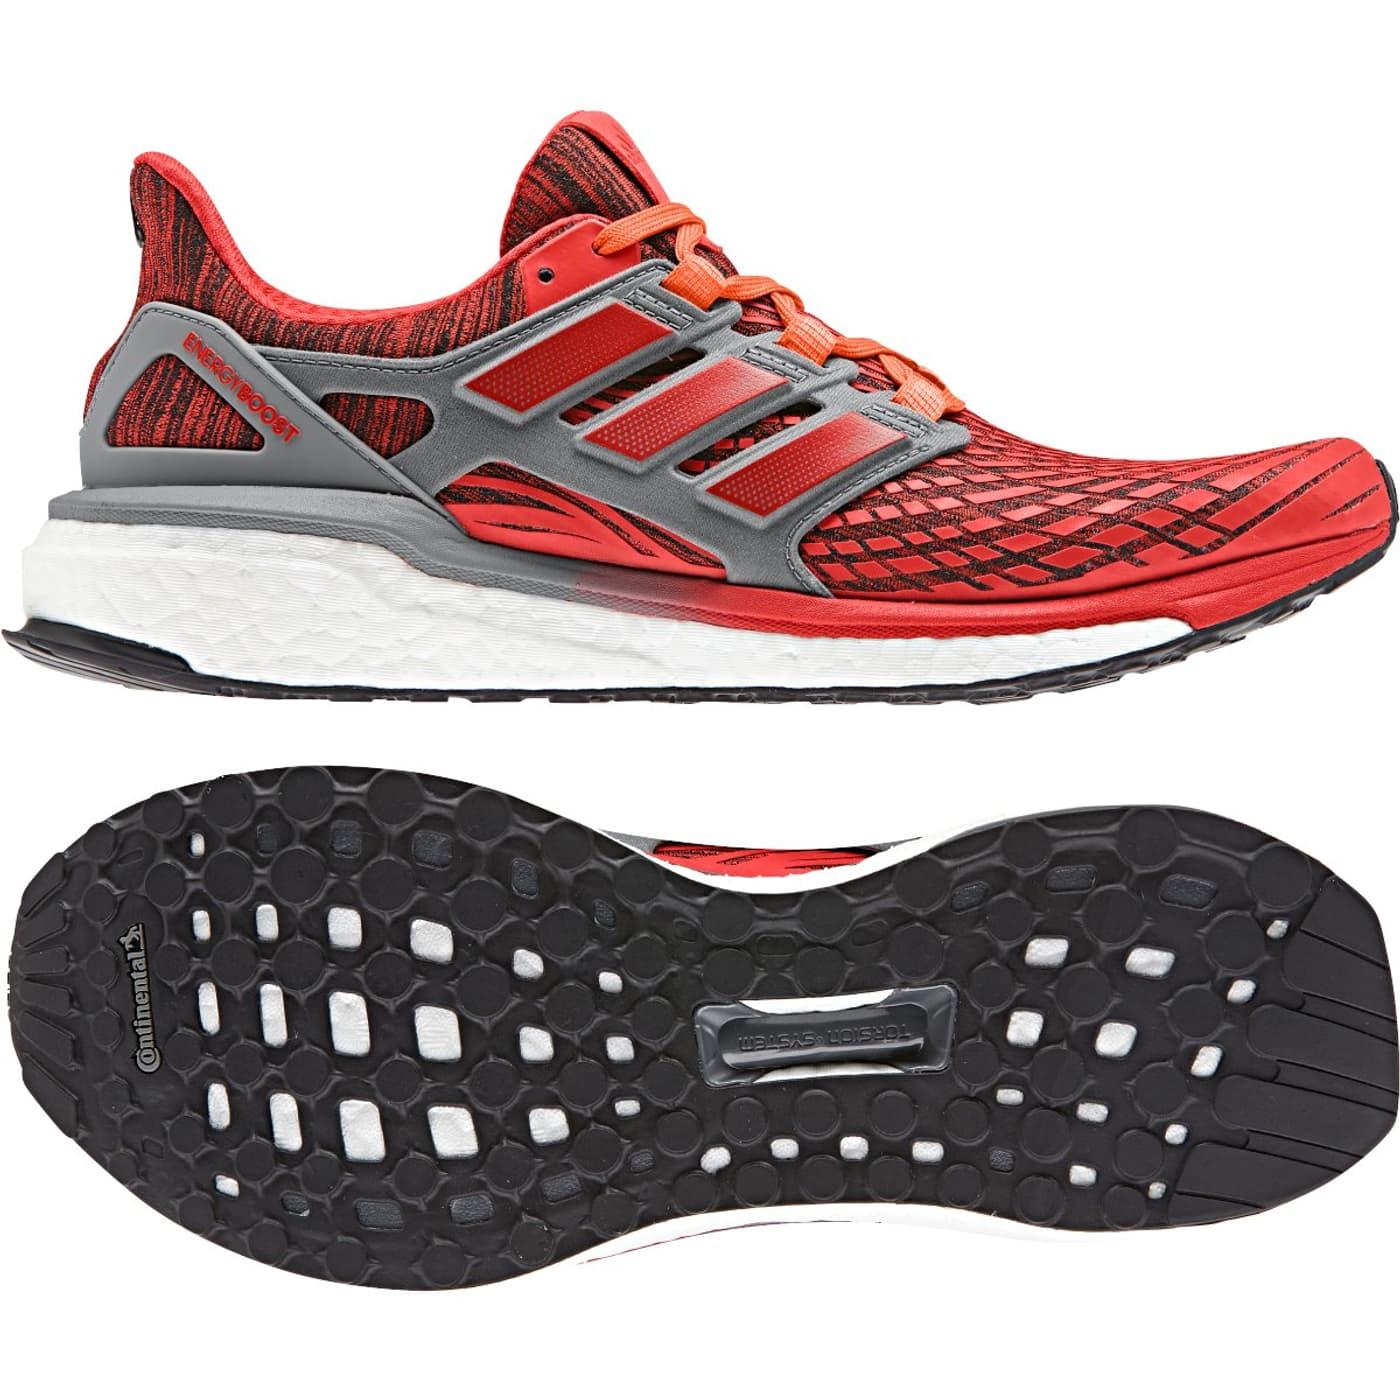 Scarpa Da Adidas 4 Boost Energy Migros Running Uomo 6ttUTf 83a16d27c32